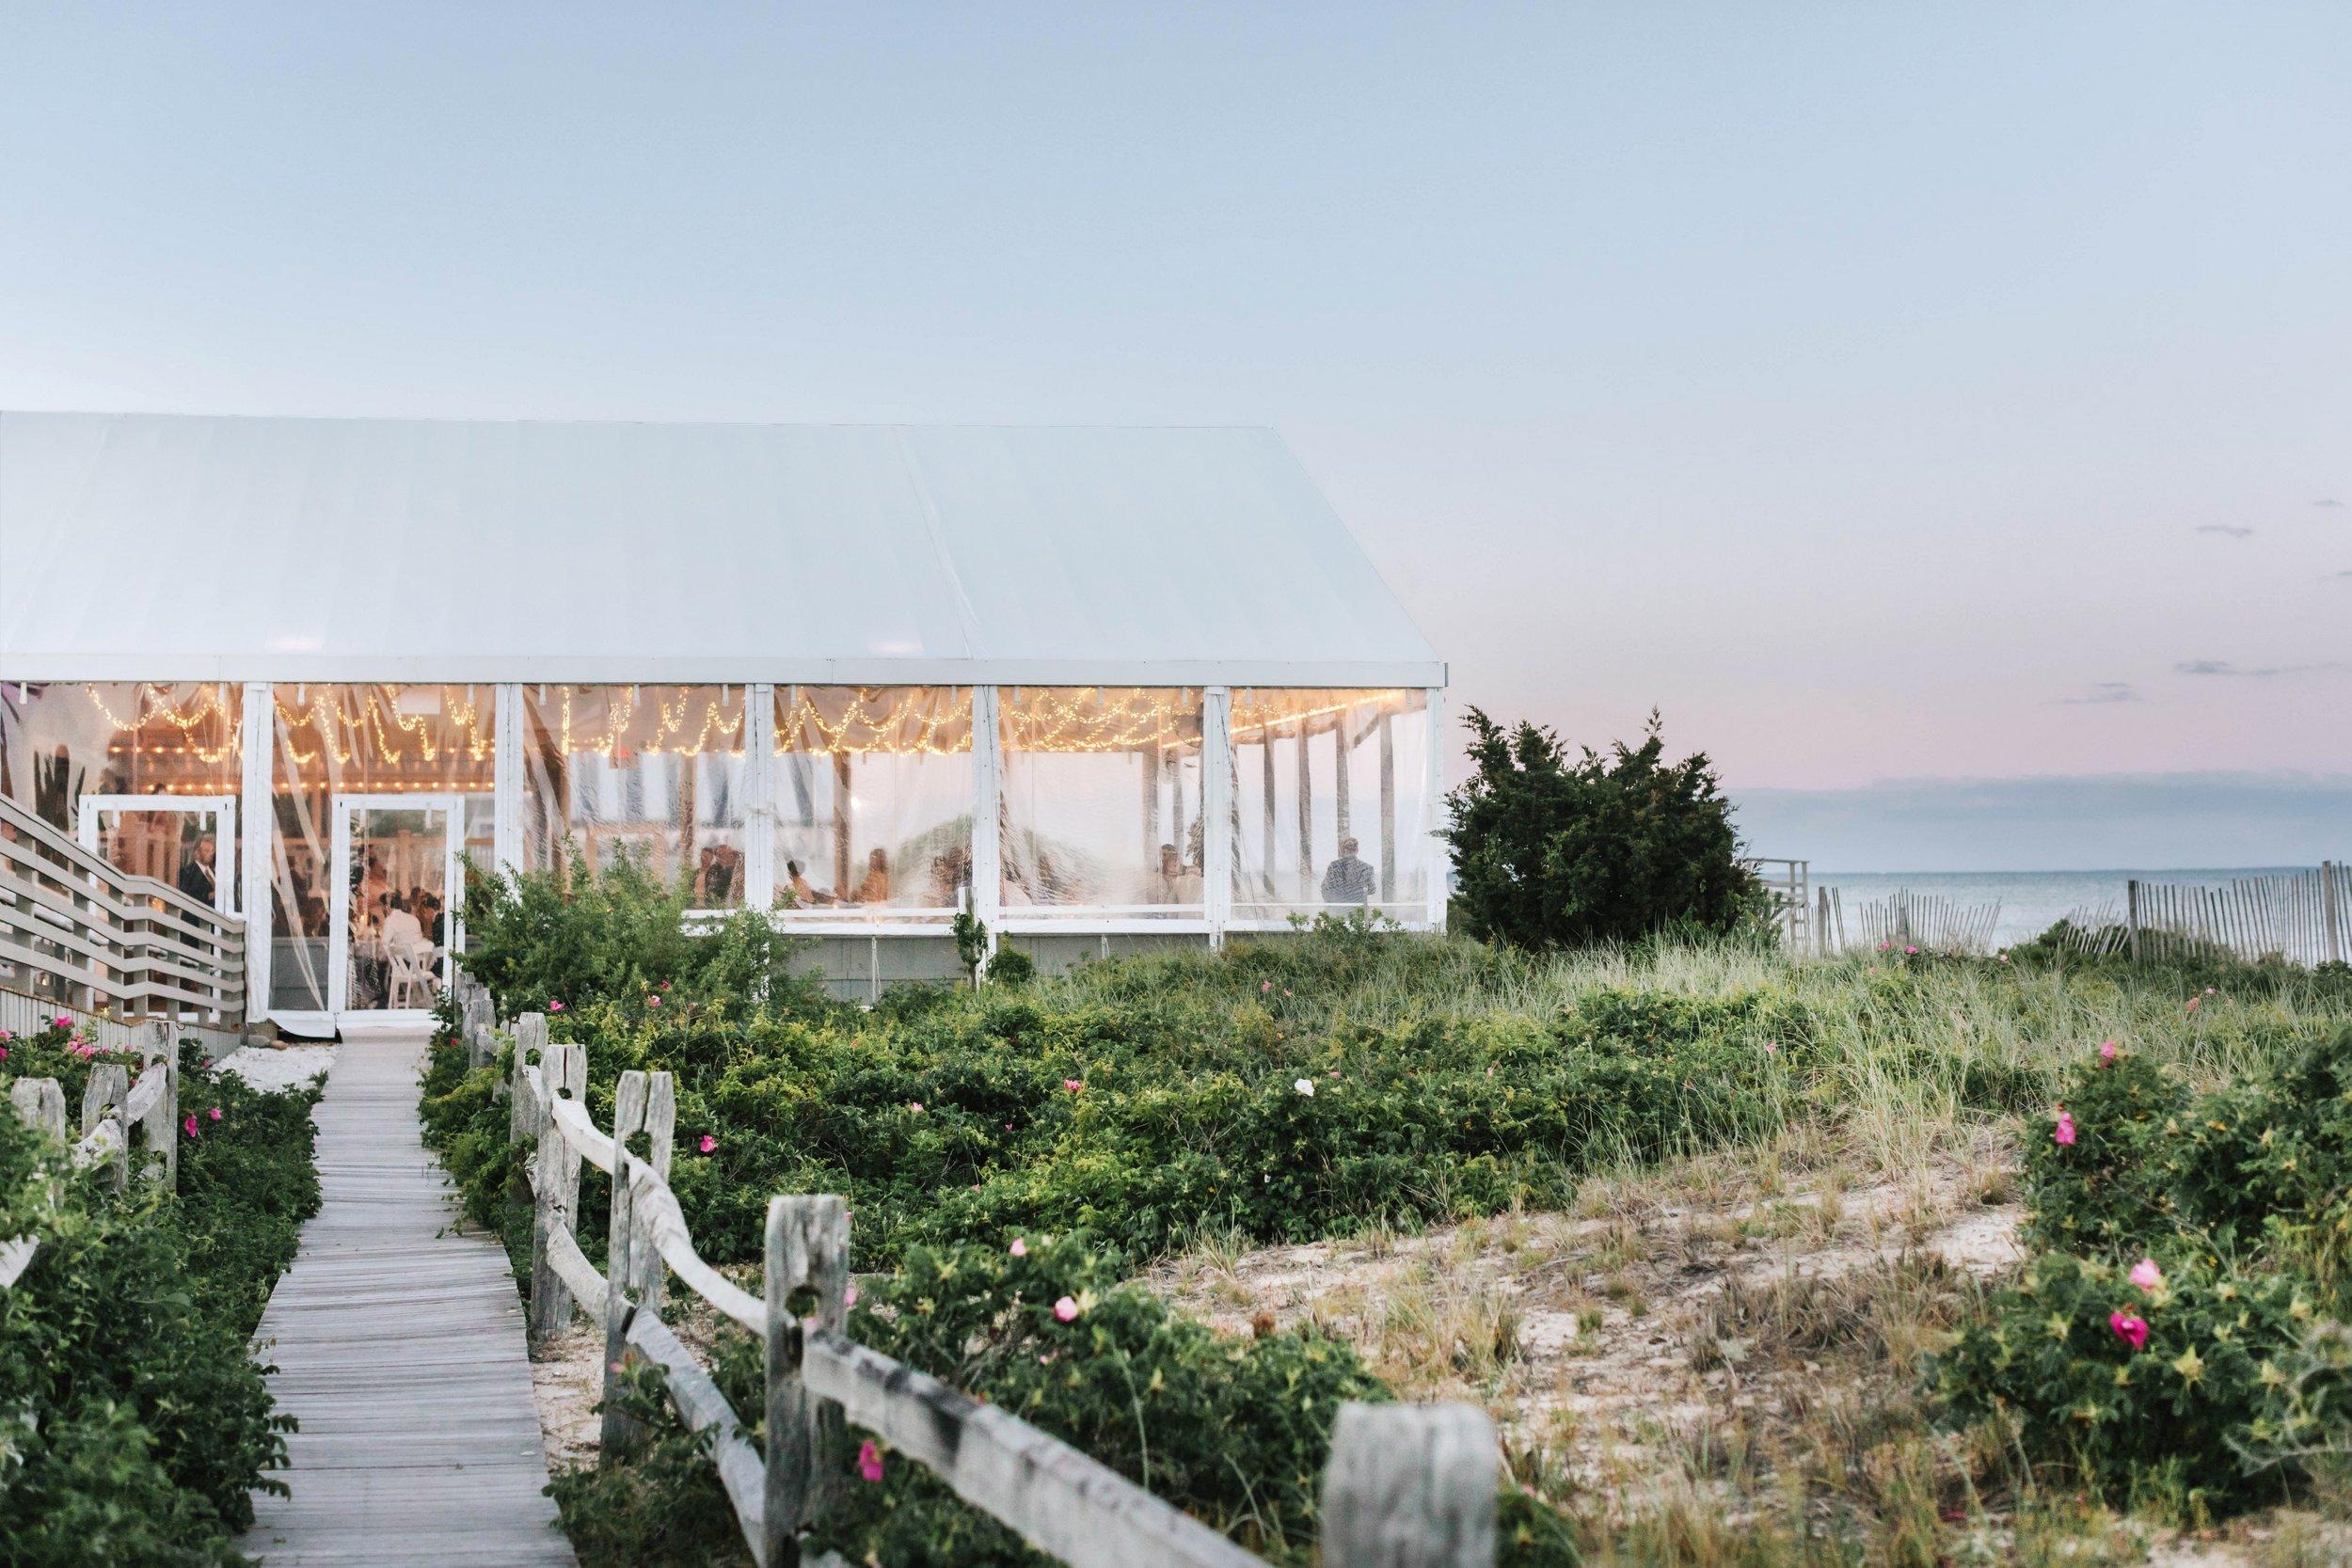 Popponesset-Inn-Wedding-Cape-Cod-Lena-Mirisola-Photography-47.jpg